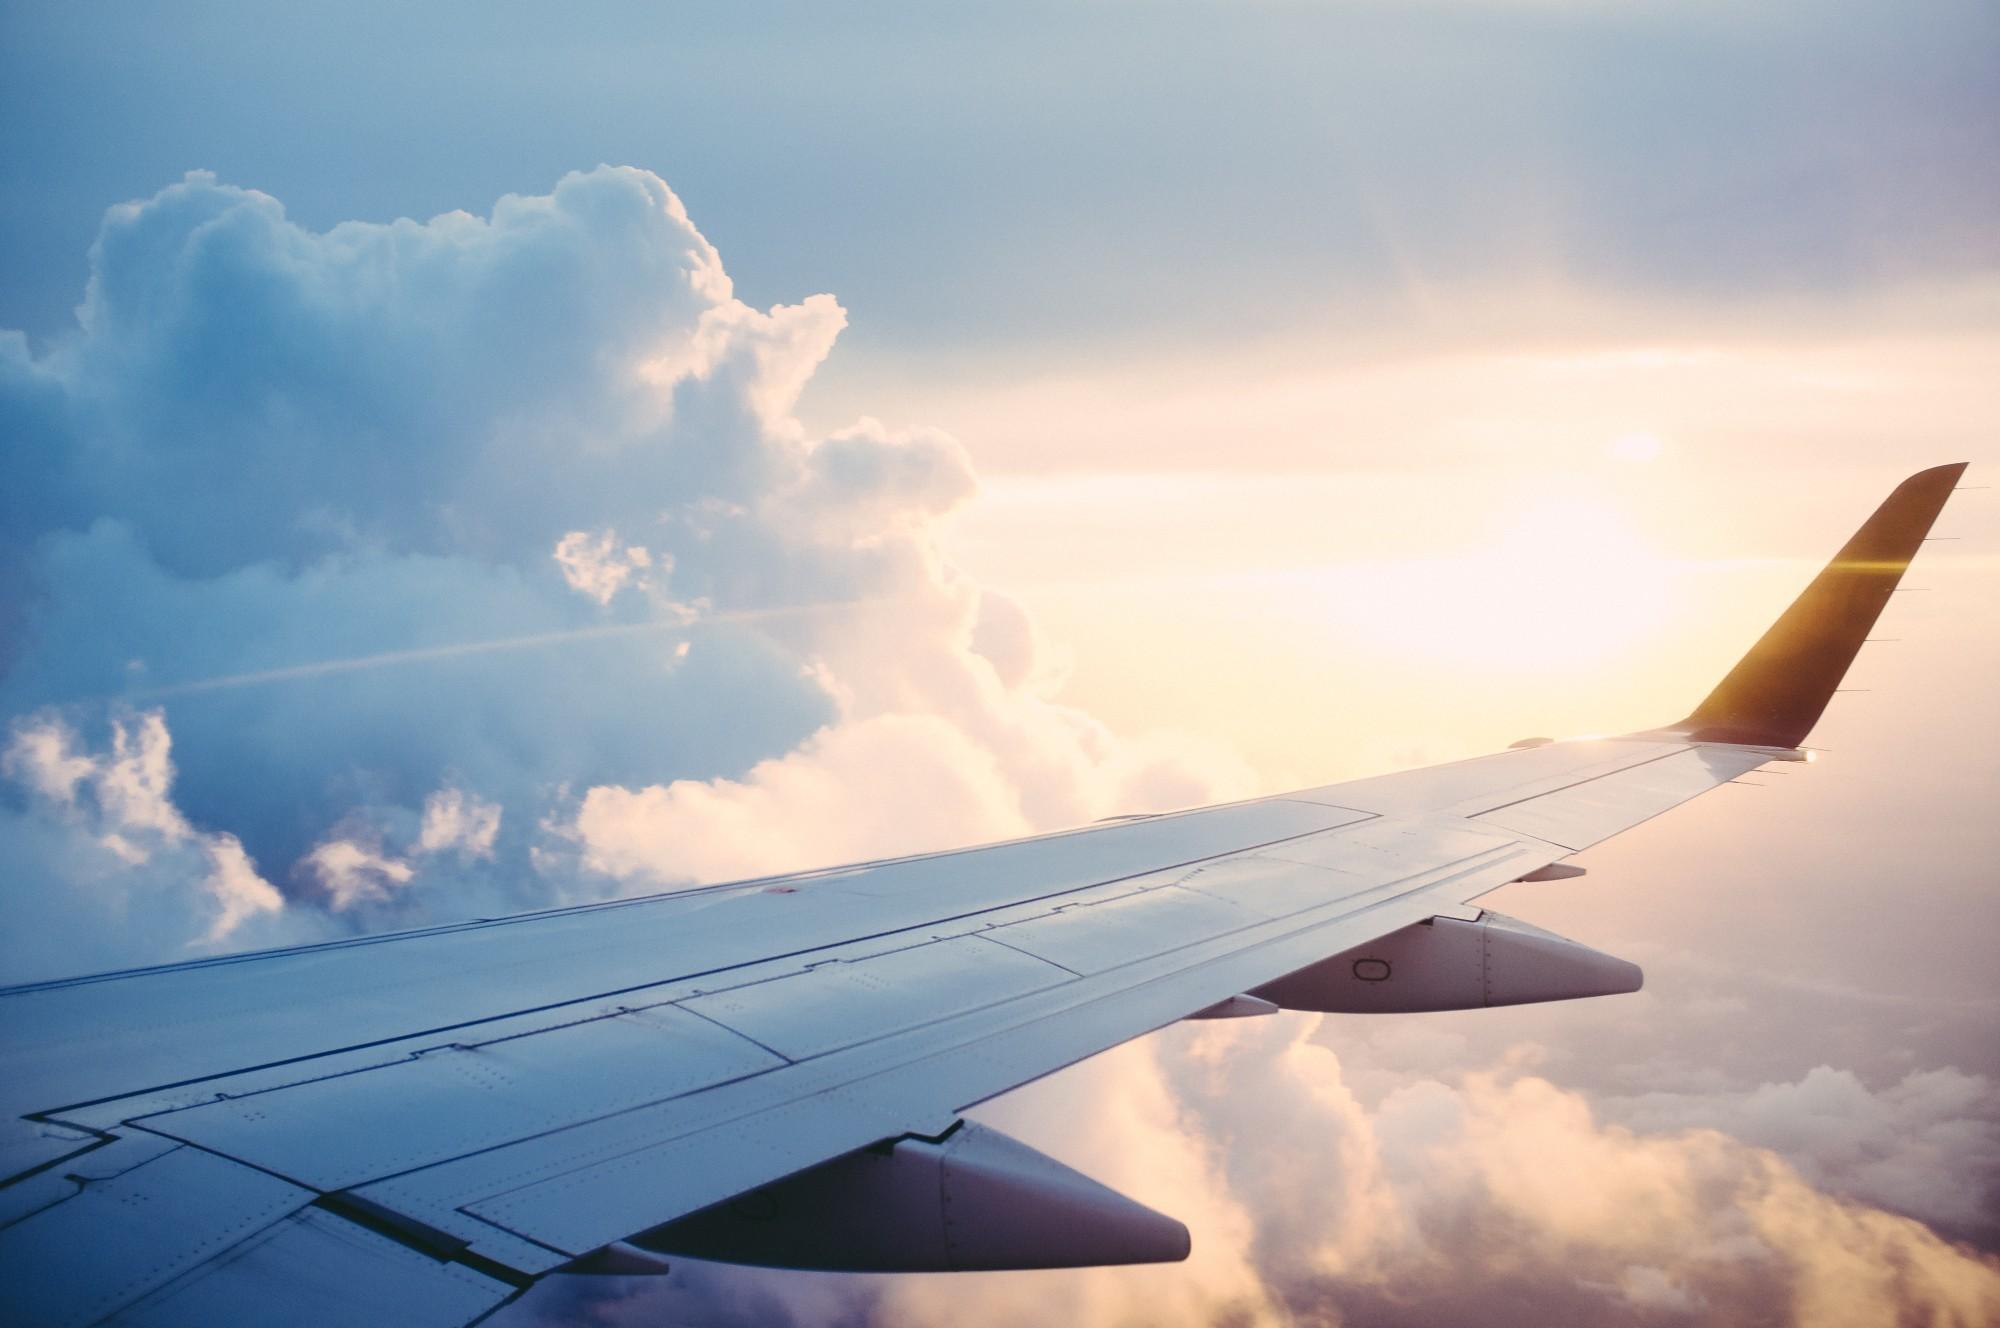 7 Key Things You Should Always Wear on a Plane